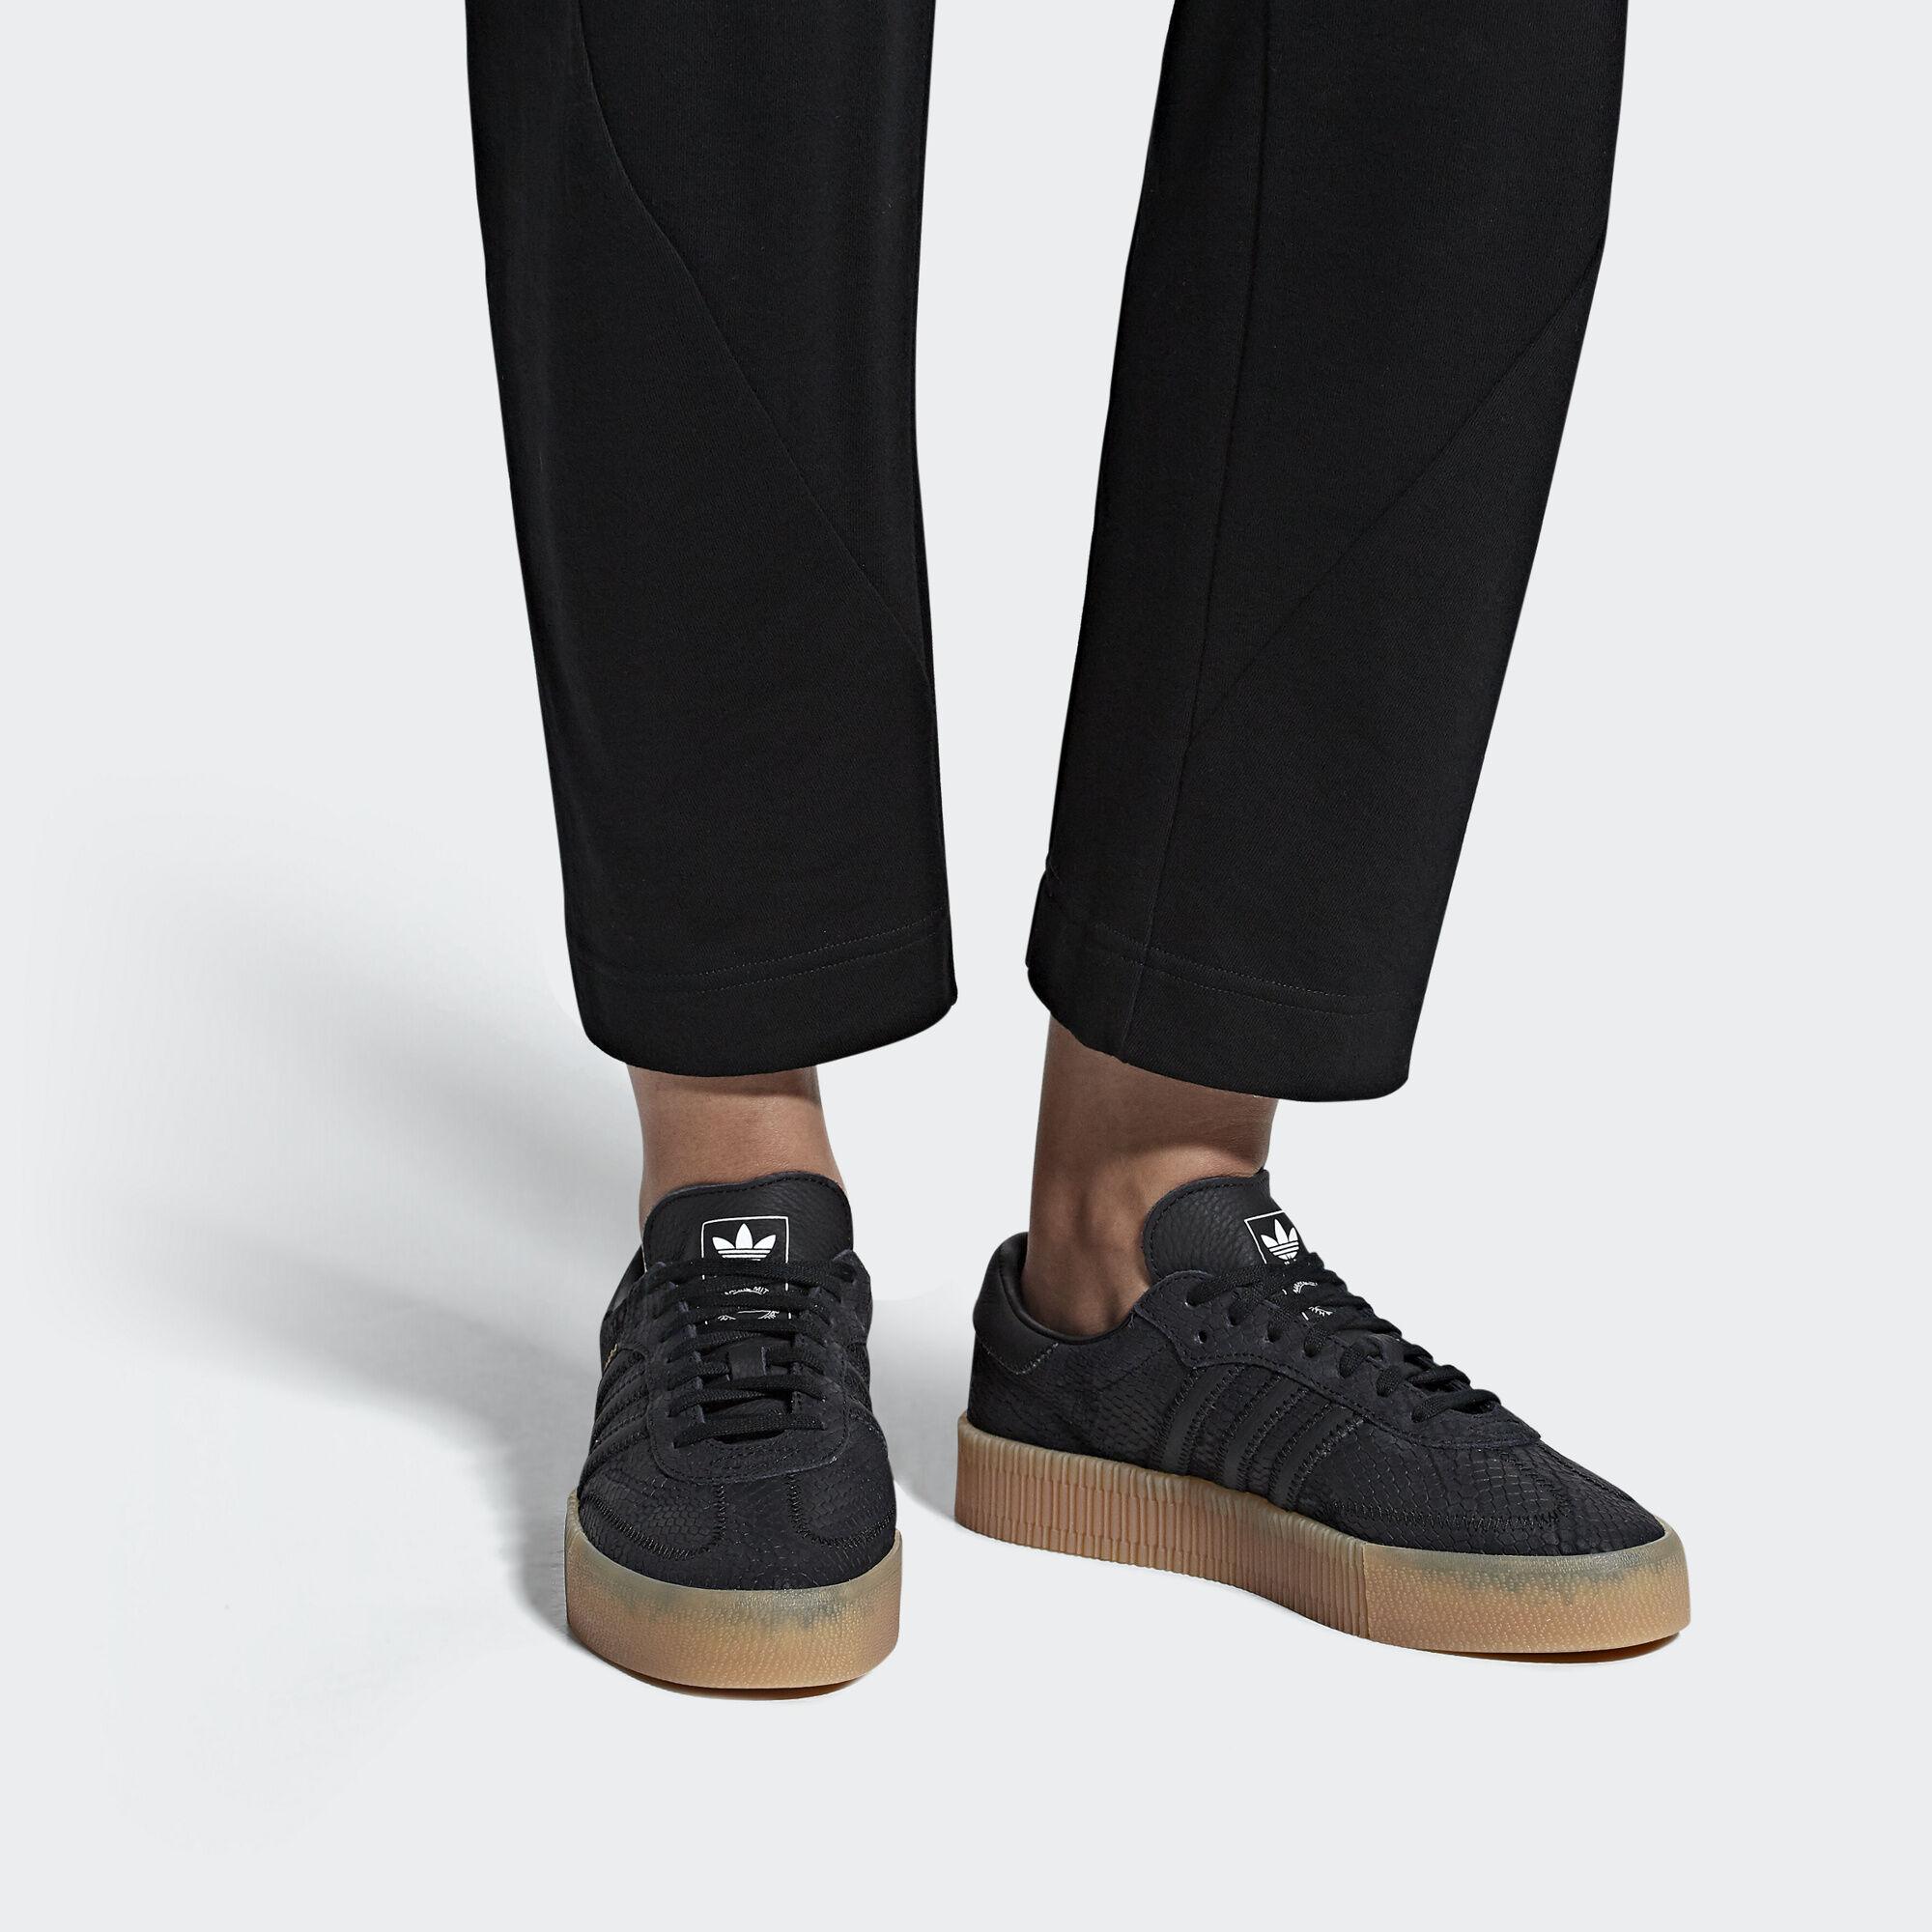 sale retailer 29c15 f7db4 adidas SAMBAROSE W - Green  adidas New Zealand